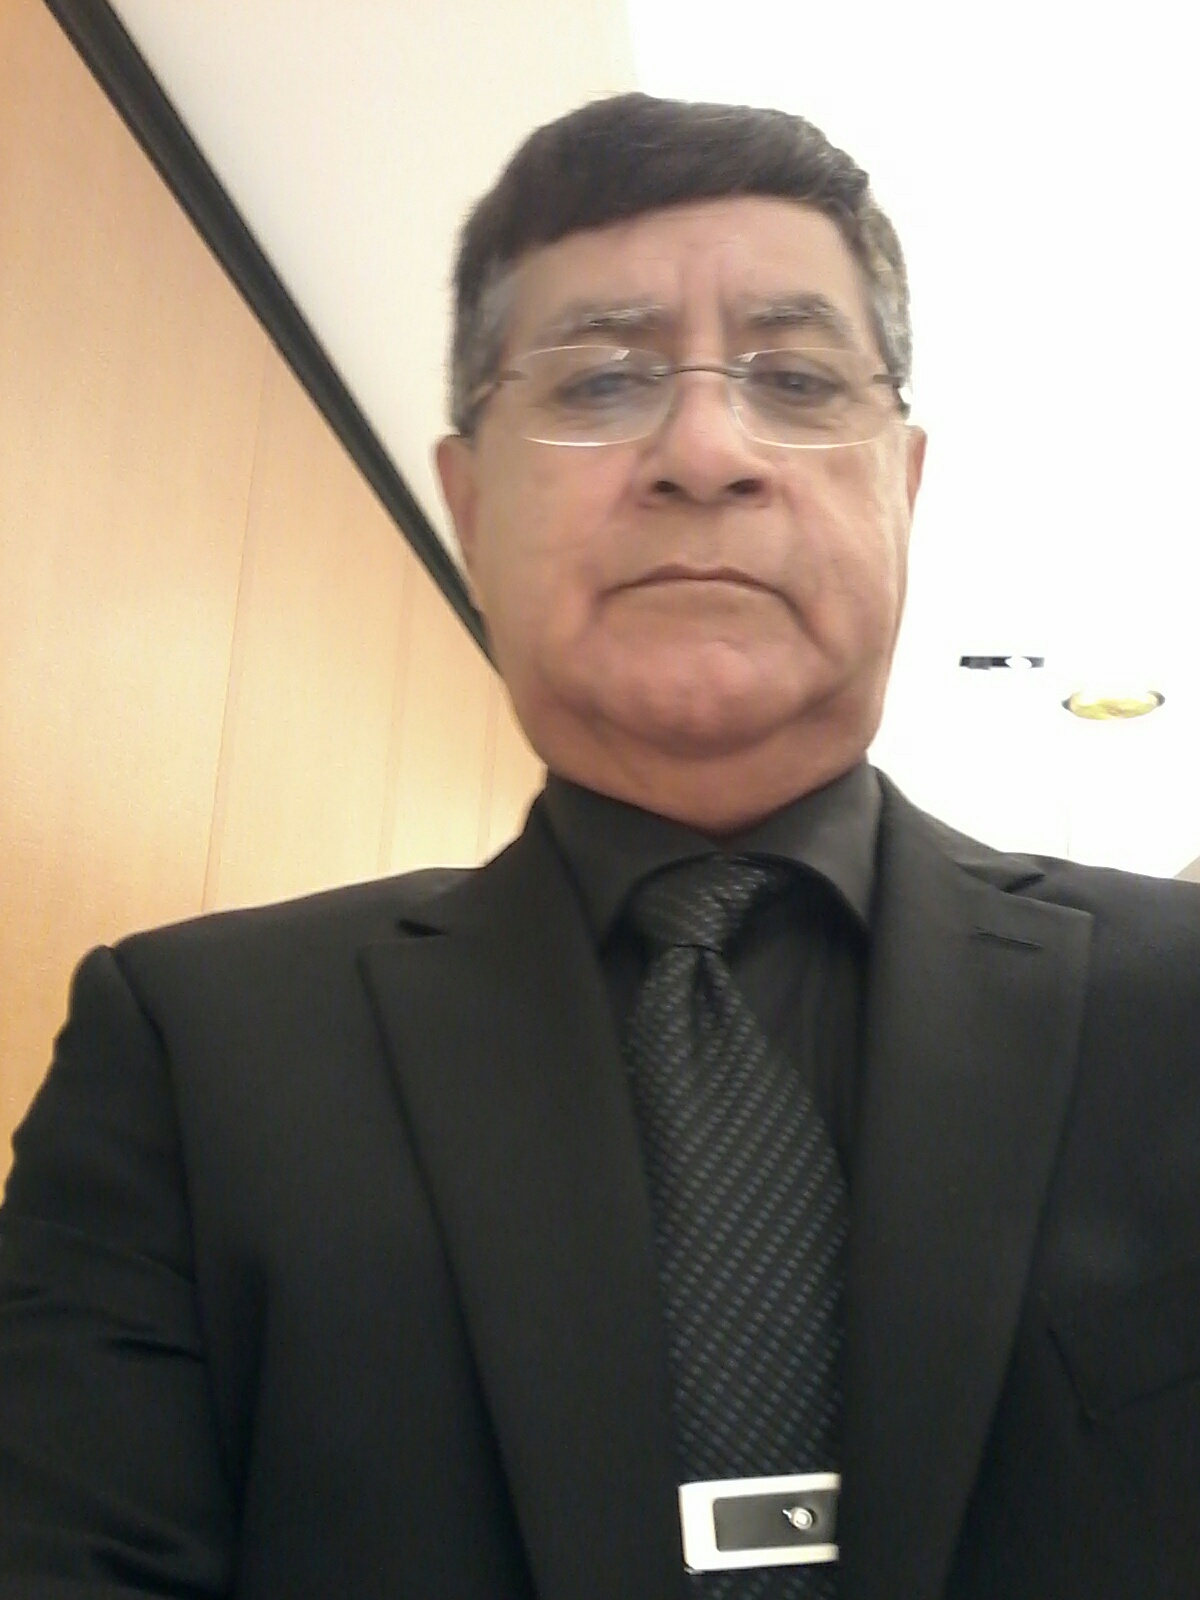 Albert Duran